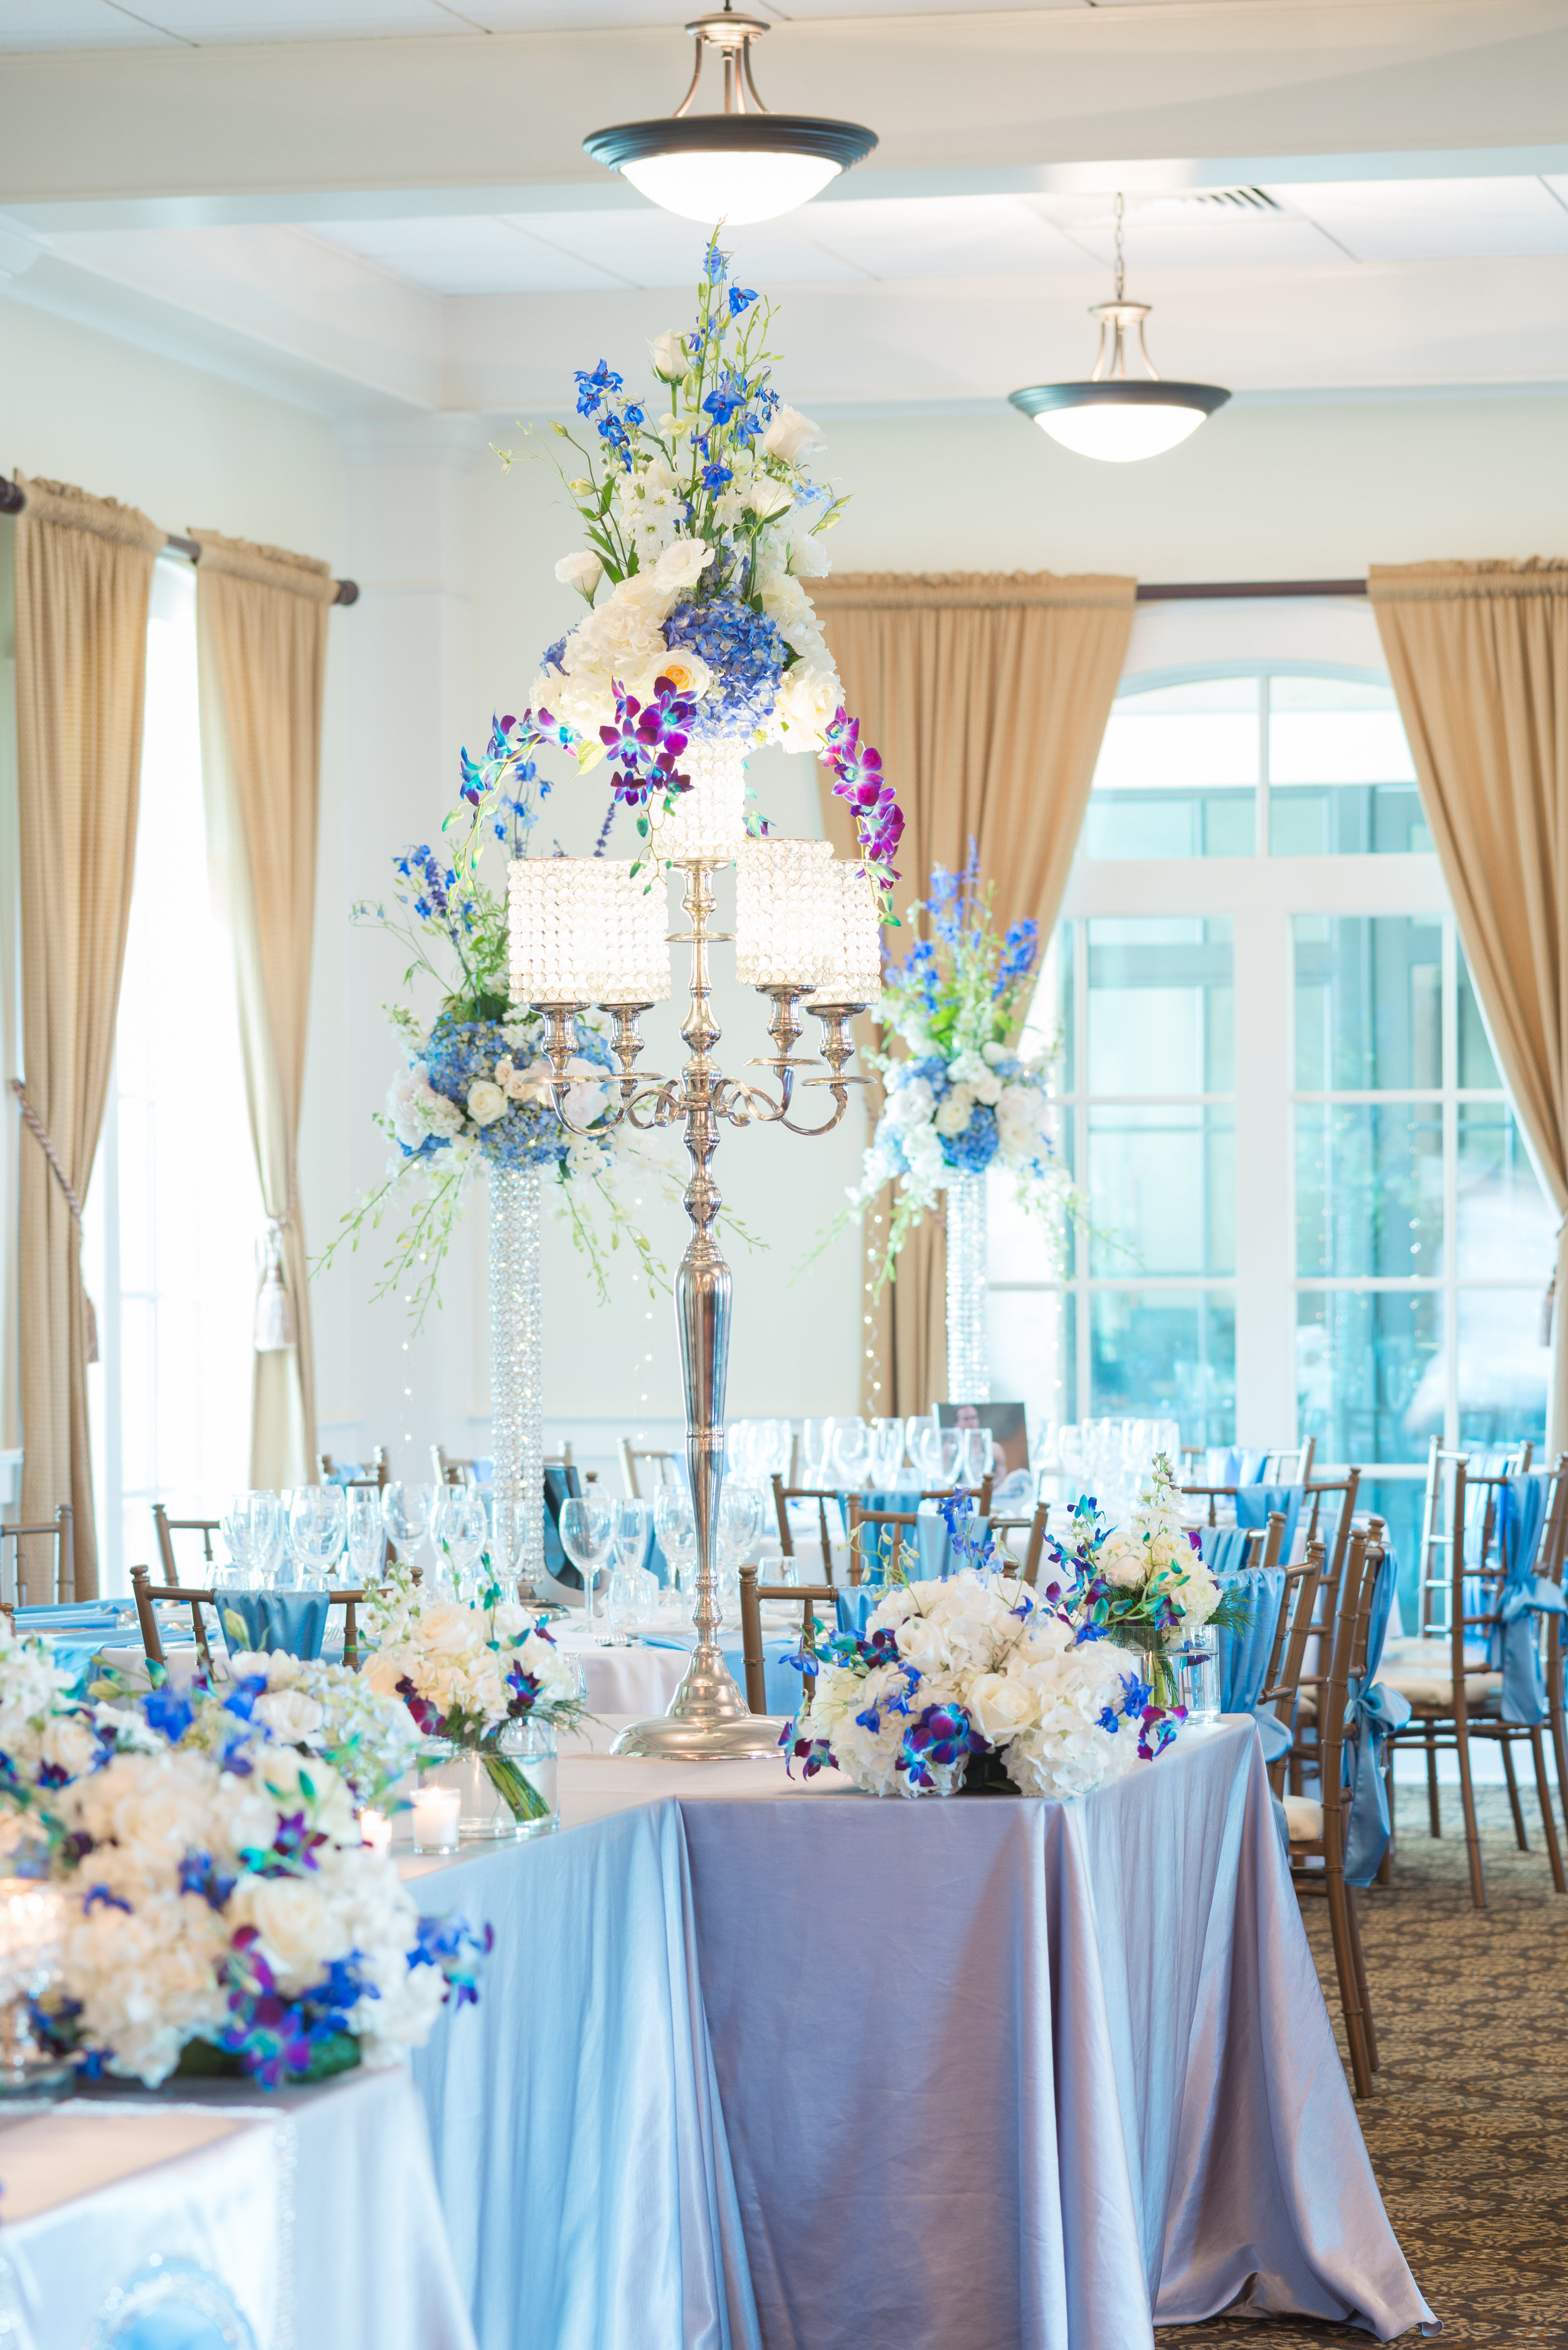 Carl-Kerridge-Photography-North-Beach-Wedding-May-2015-023.jpg